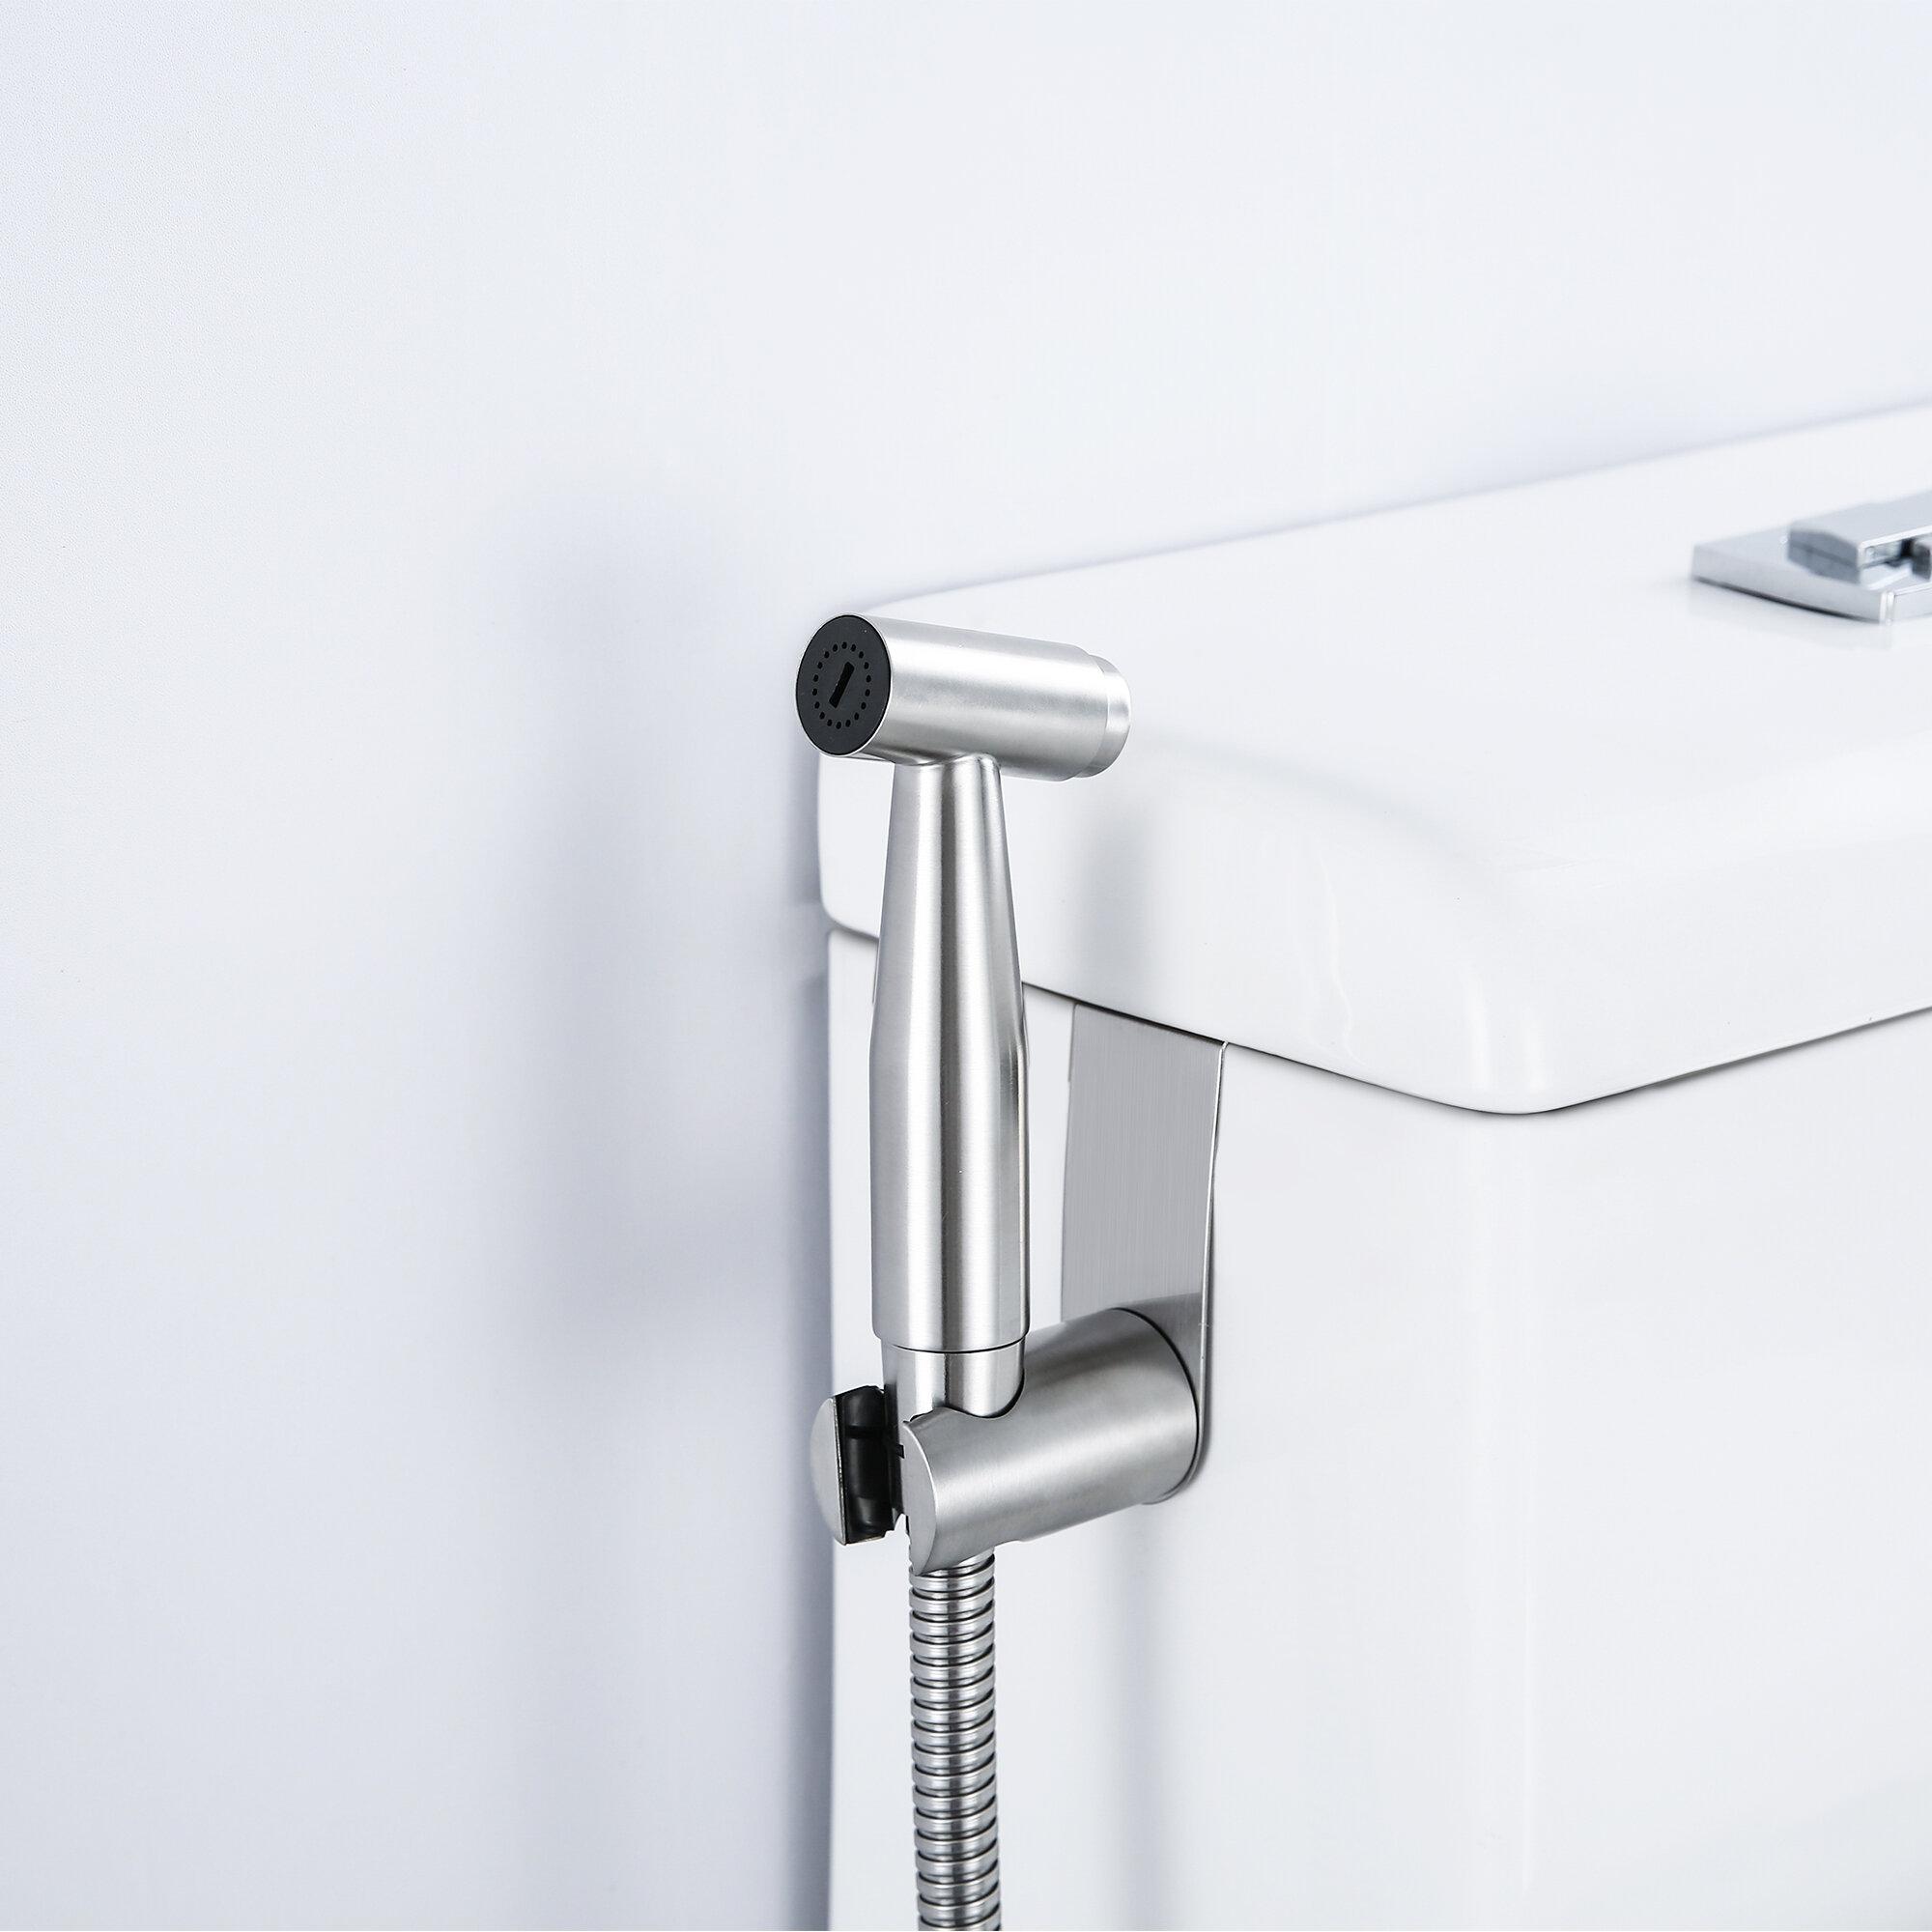 Bathroom Handheld Toilet Bidet Shower Sprayer Hose Holder Wall Bracket